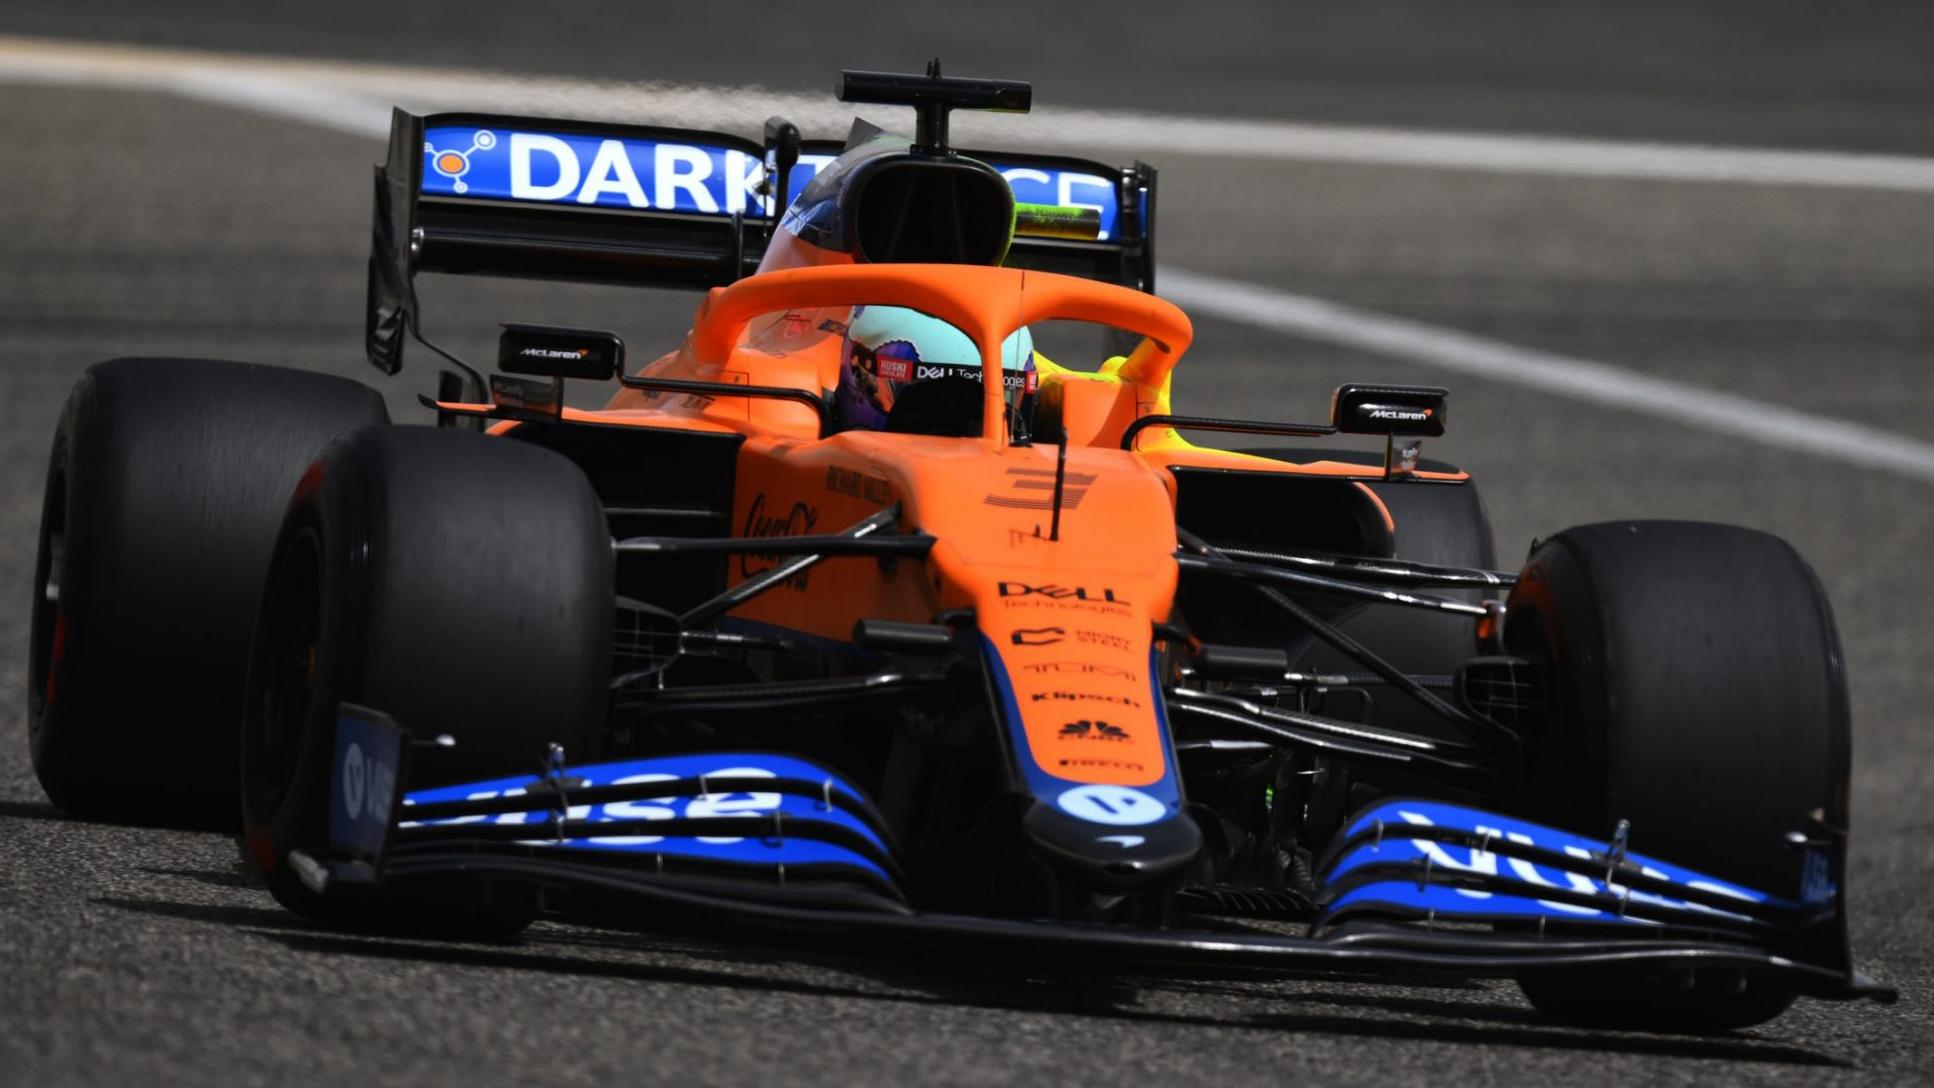 McLaren de Daniel Ricciardo vista de frente